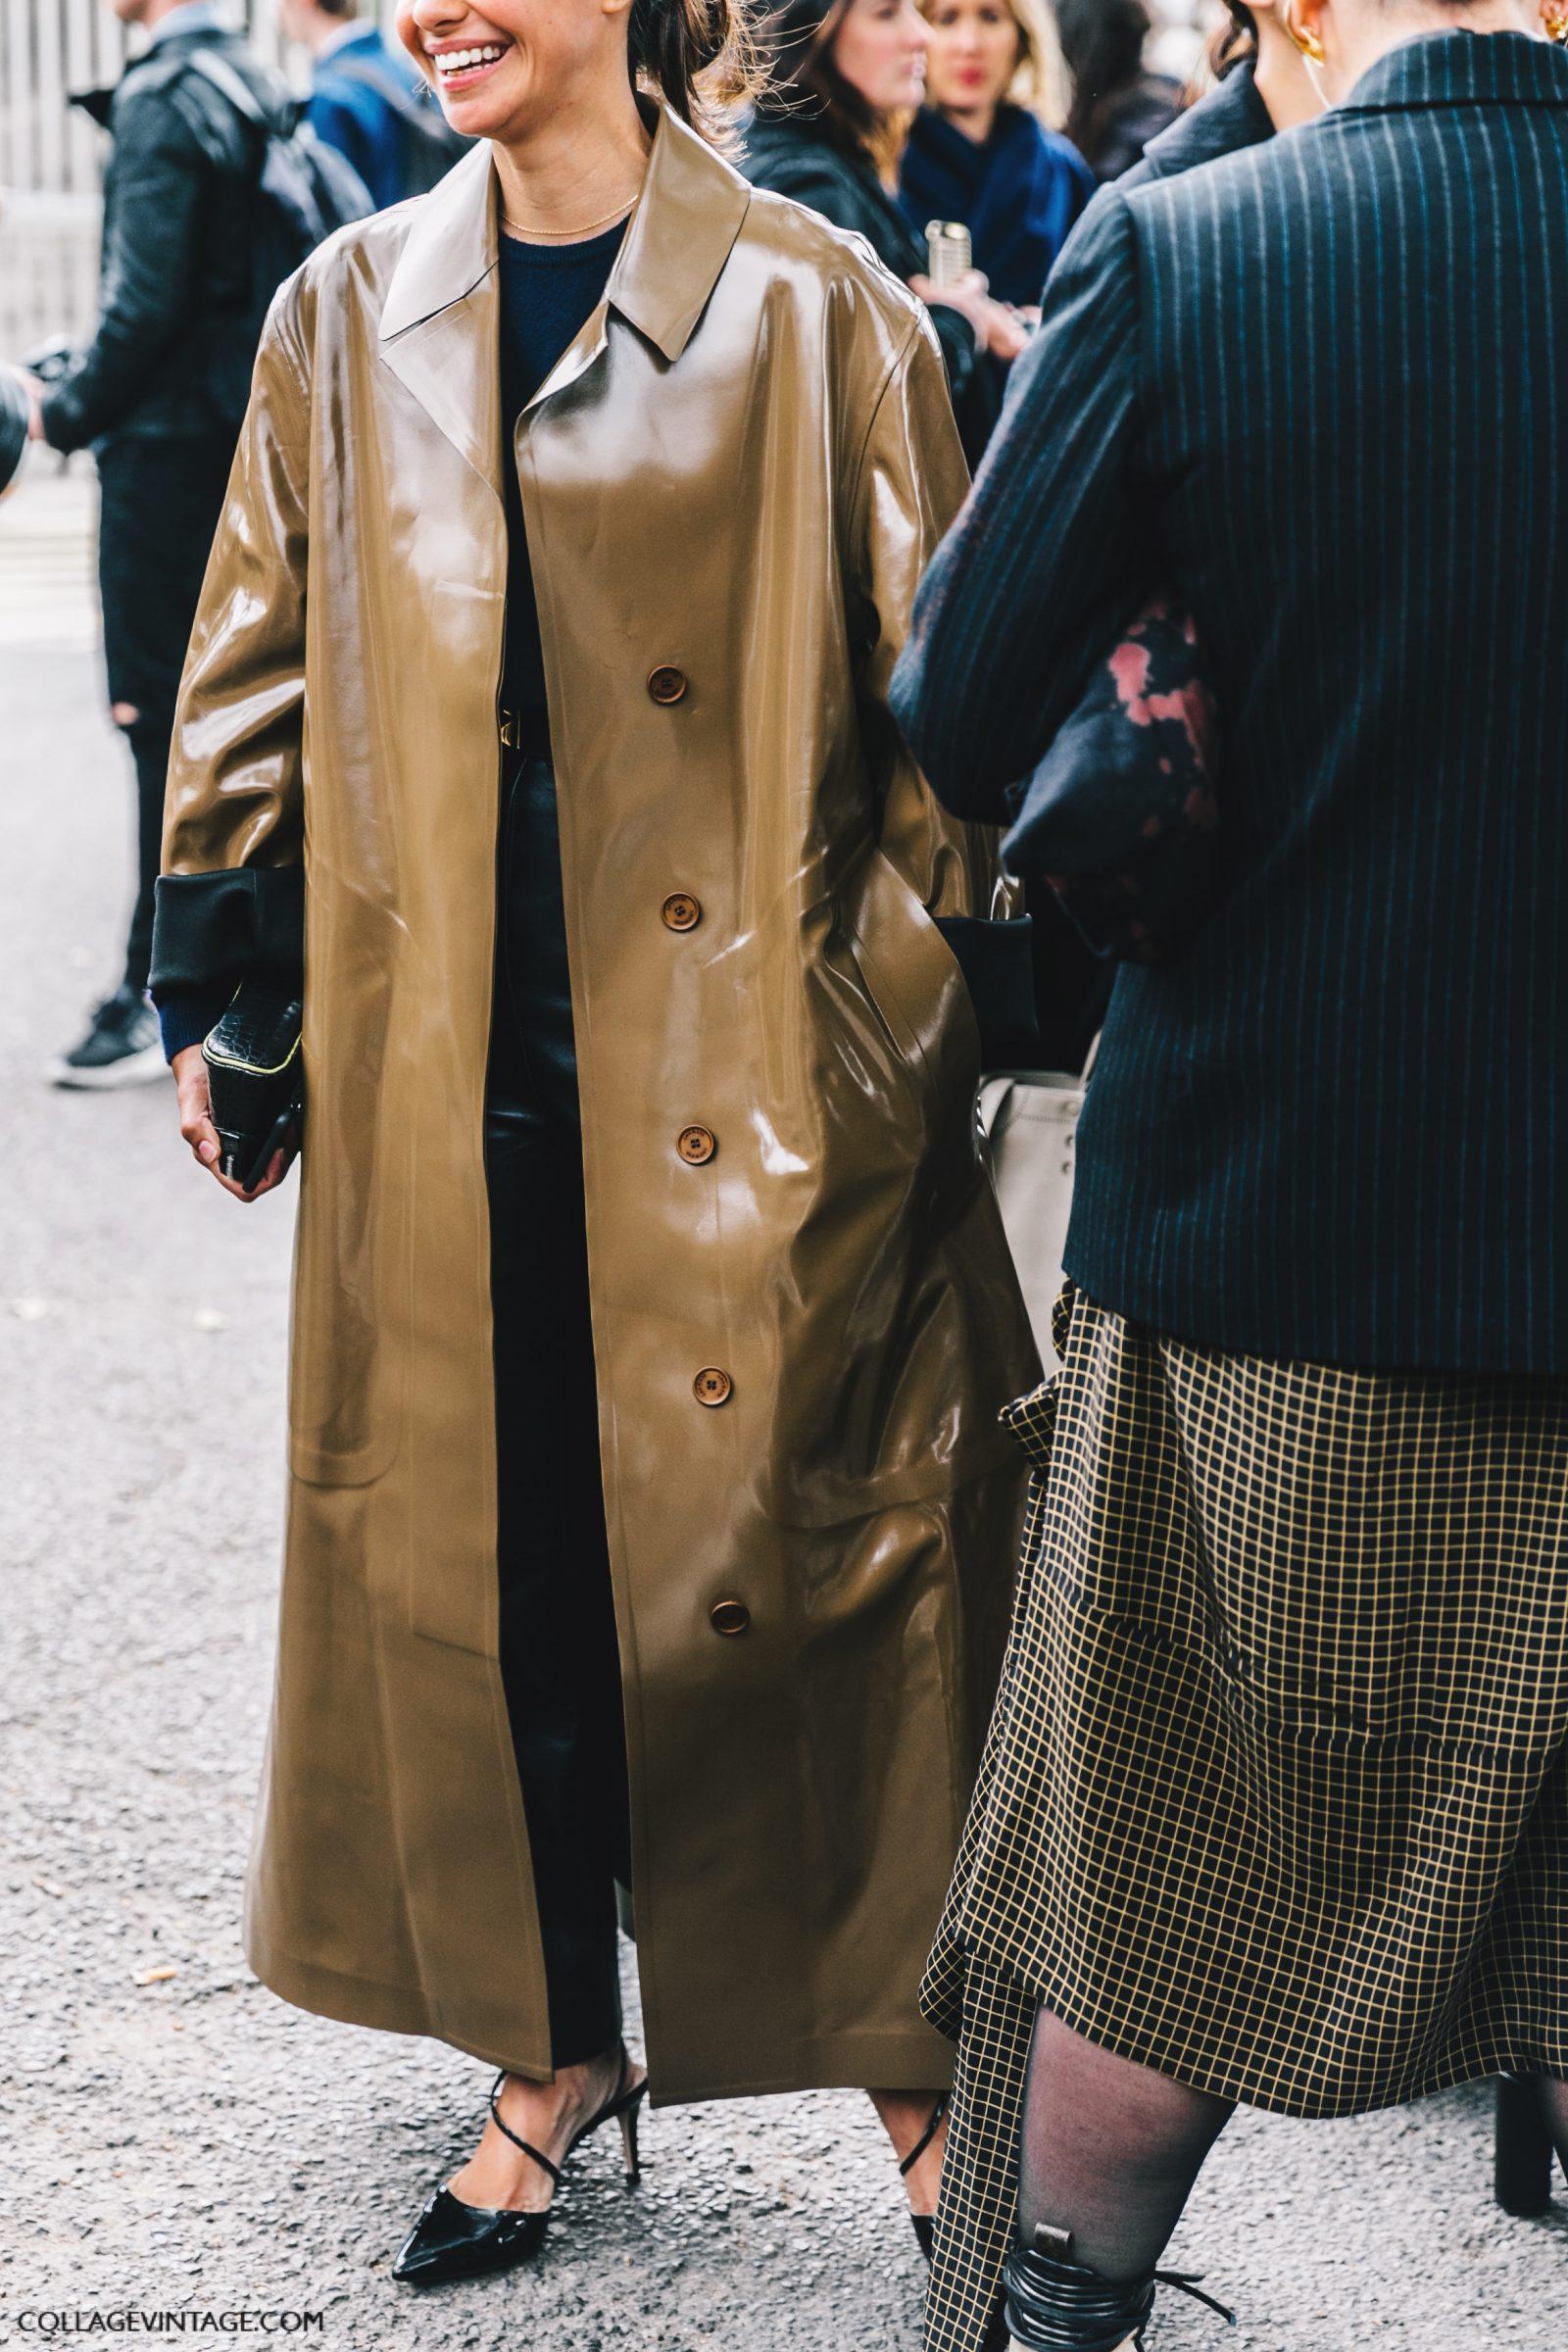 pfw-paris_fashion_week_ss17-street_style-outfits-collage_vintage-valentino-balenciaga-celine-39